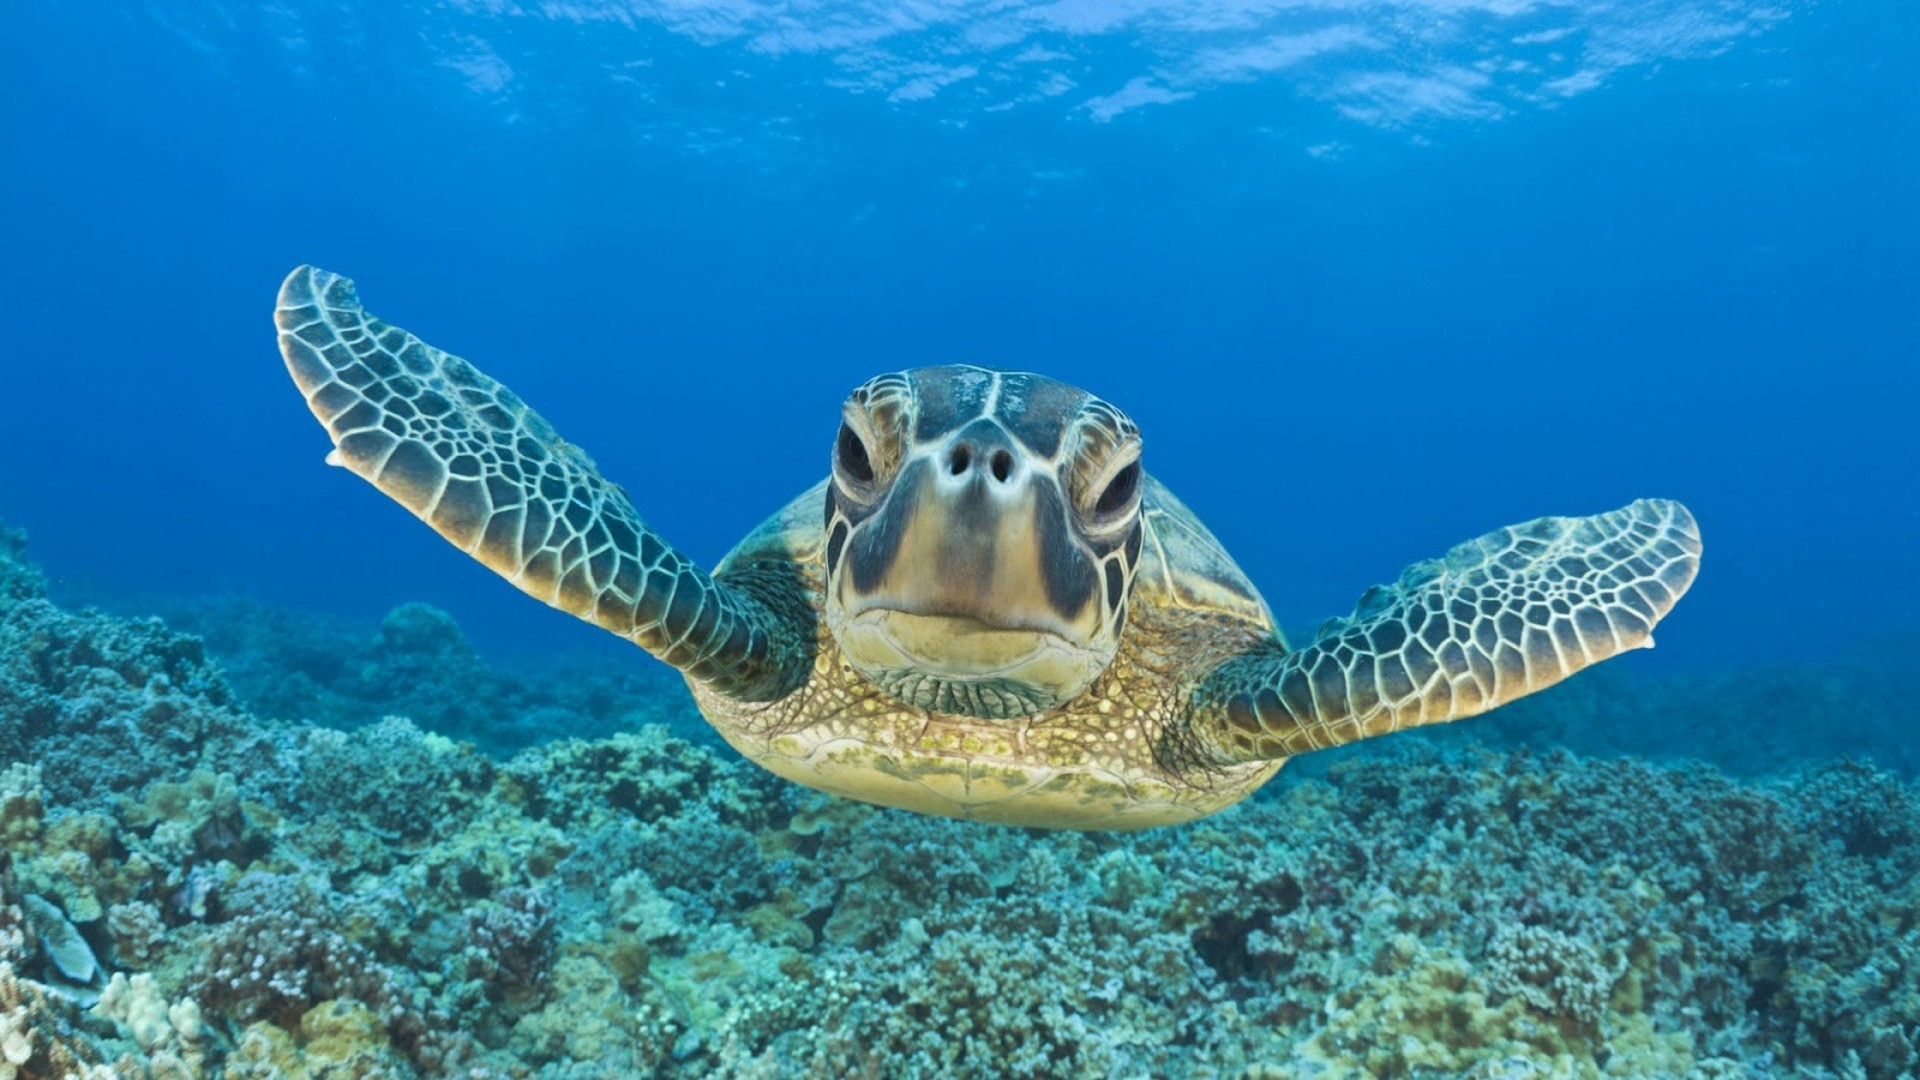 Wallpapers : Turtle Swimming Underwater Hd Animal Wallpaper Turtles .